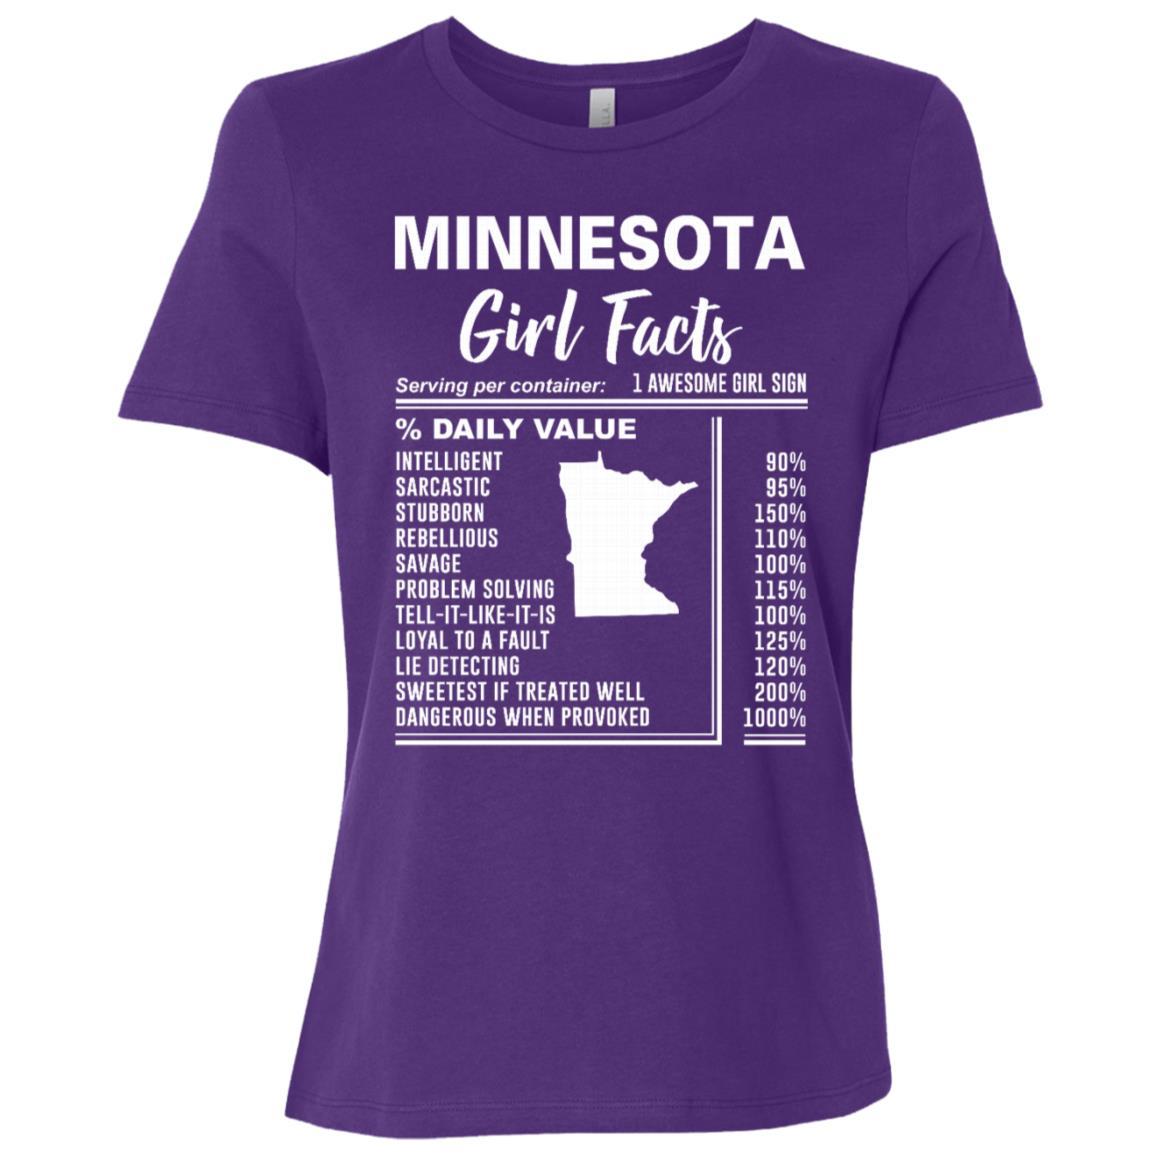 Born in Minnesota – Minnesota Girl Facts Women Short Sleeve T-Shirt